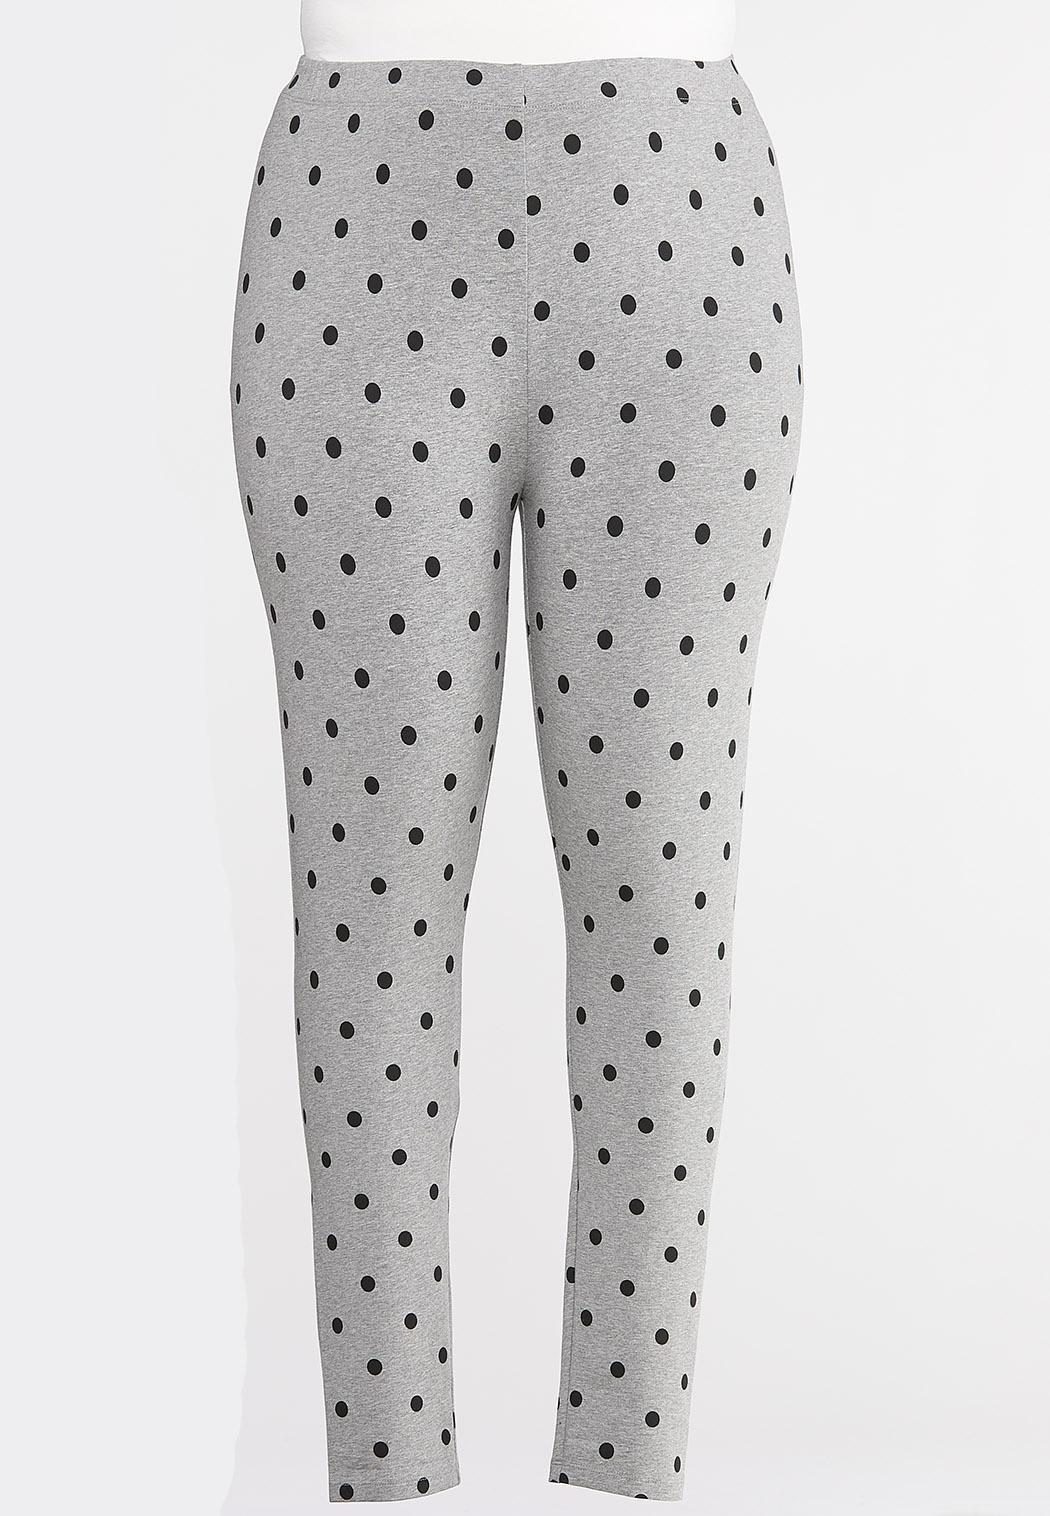 Plus Size Heathered Dot Leggings